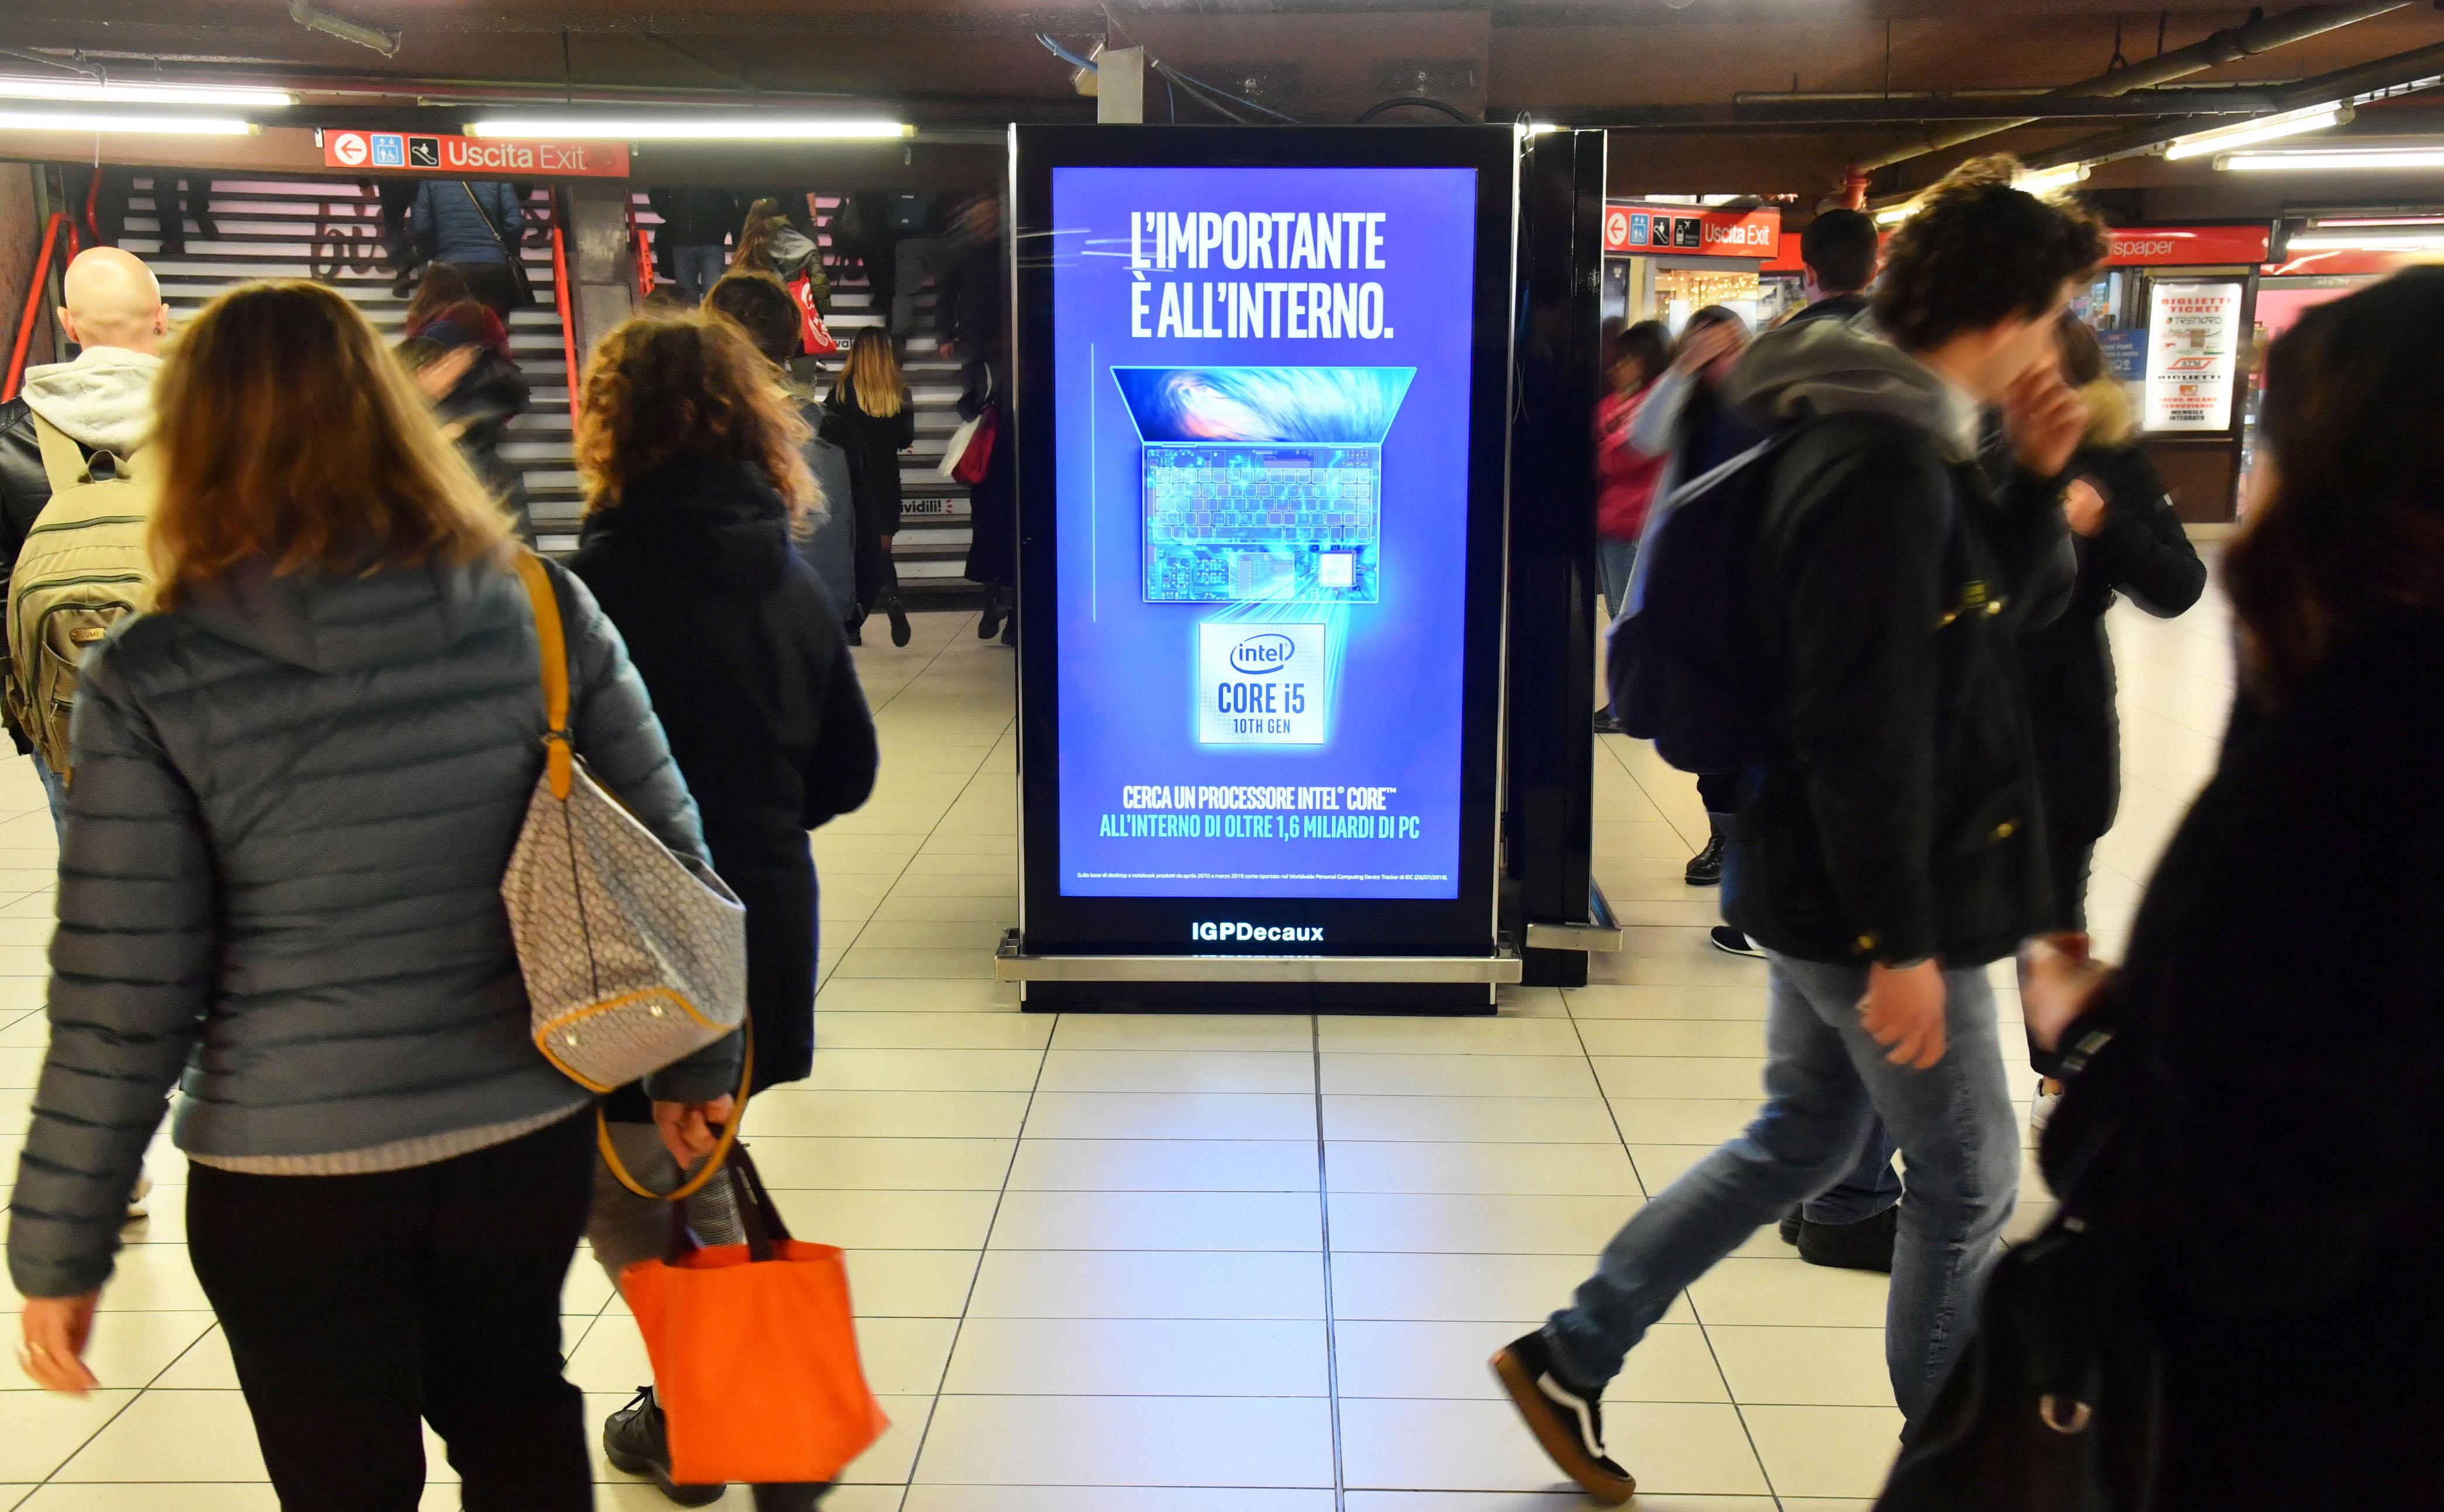 iVision_IGPDecaux_metropolitana_Milano_schermi_digitali